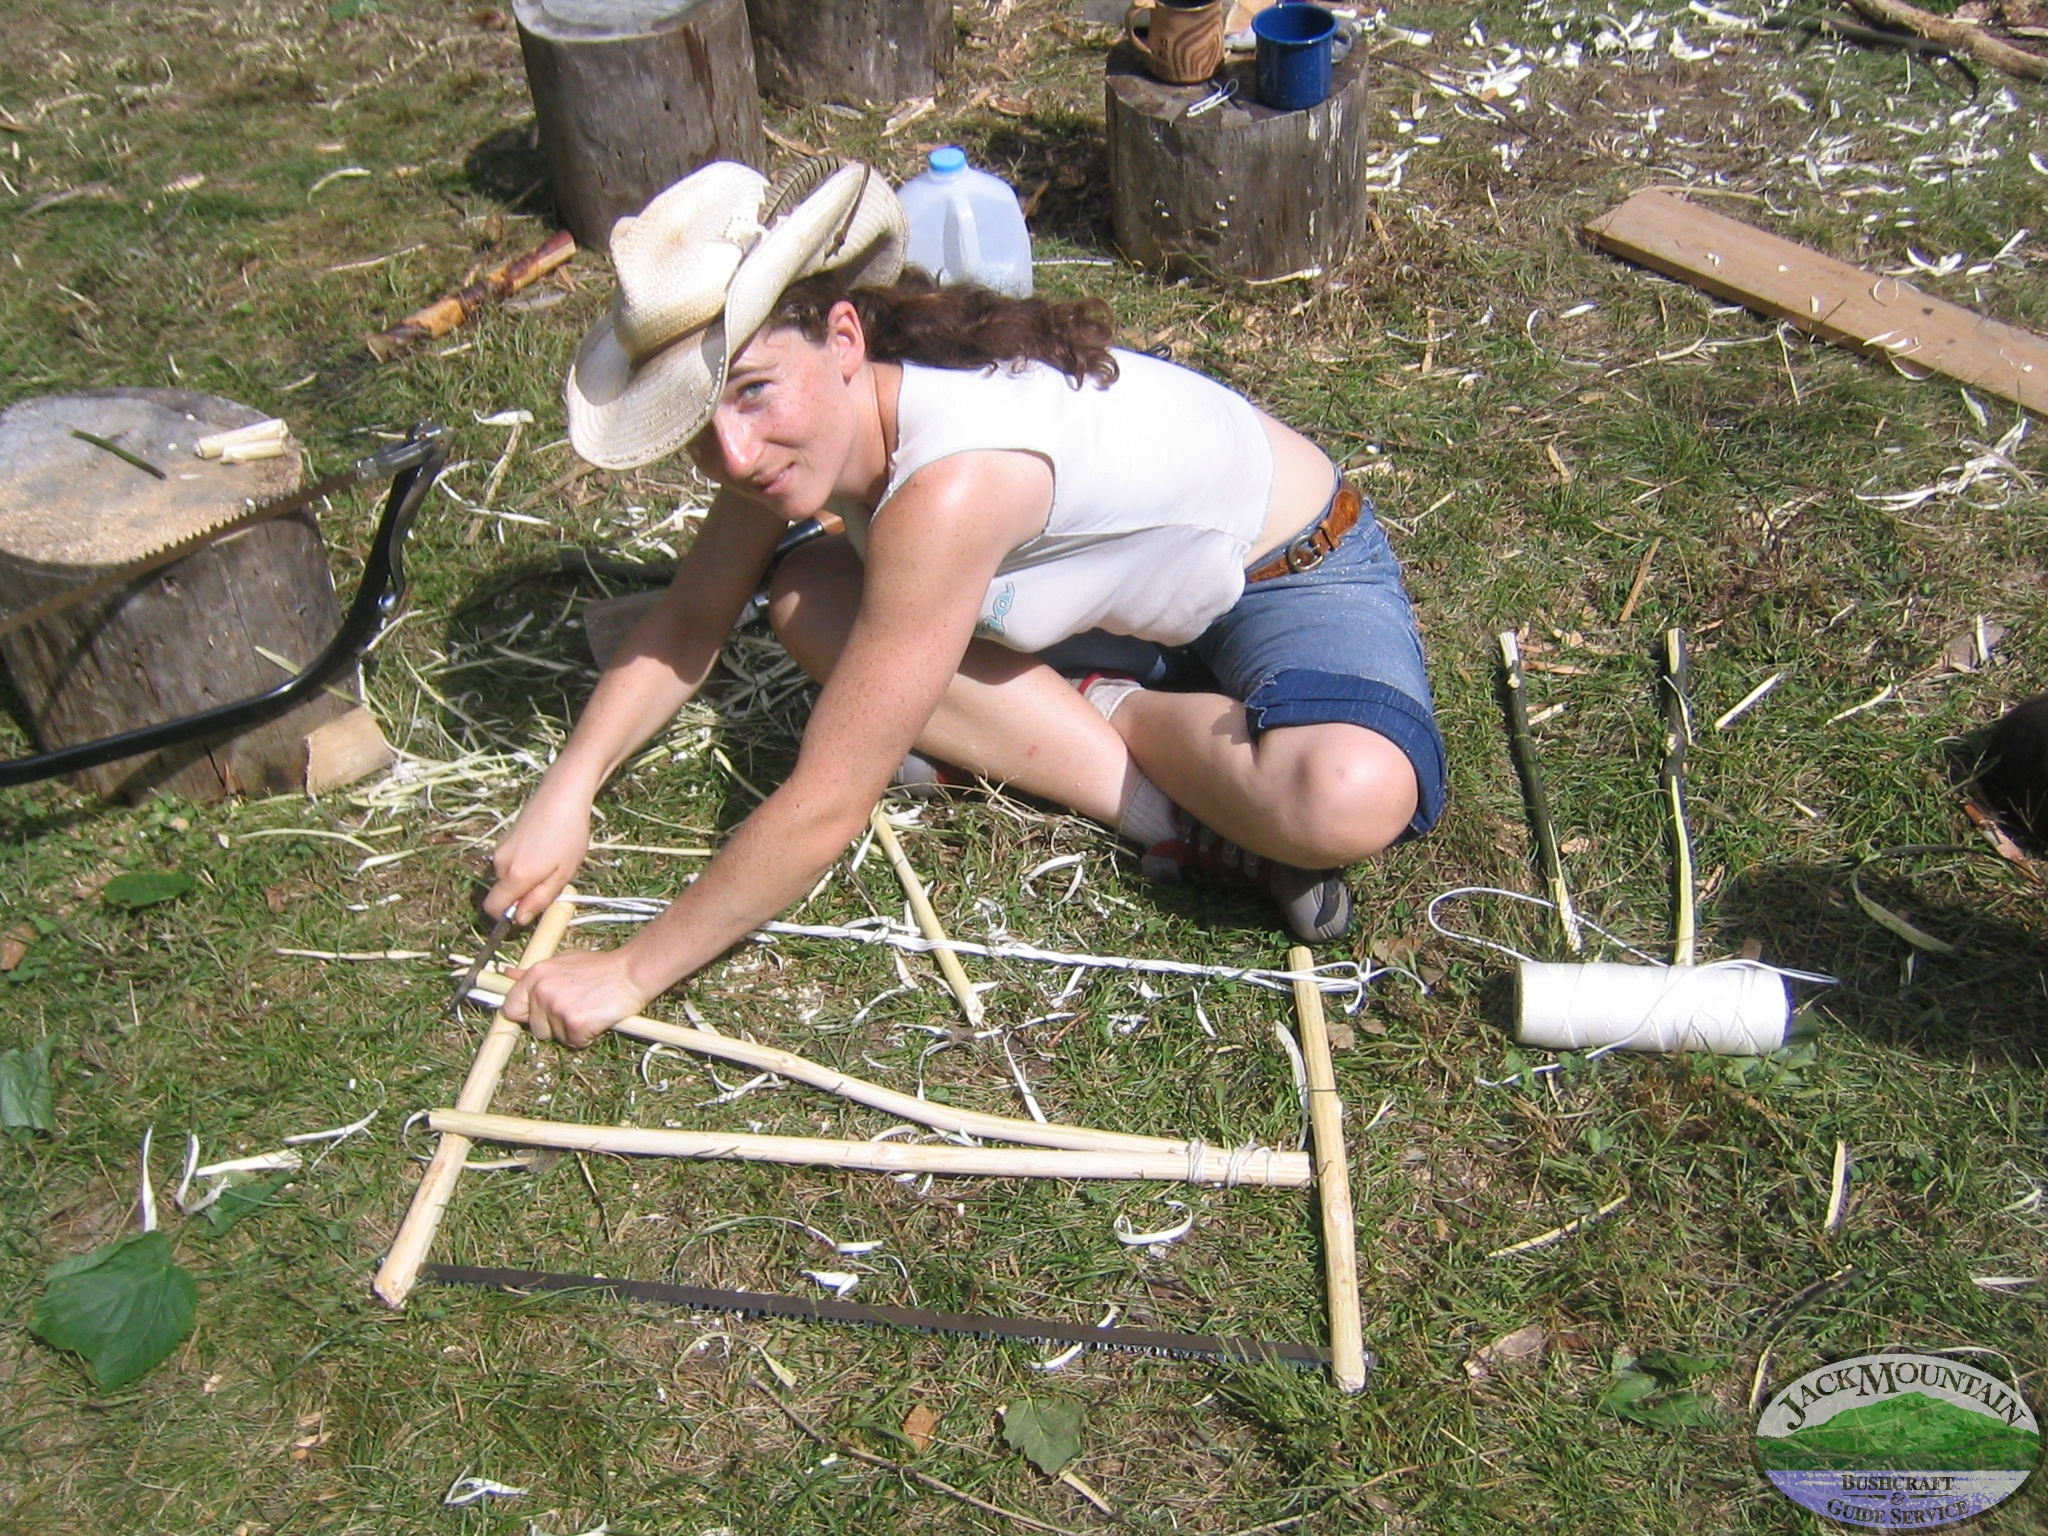 Assembling A Saw